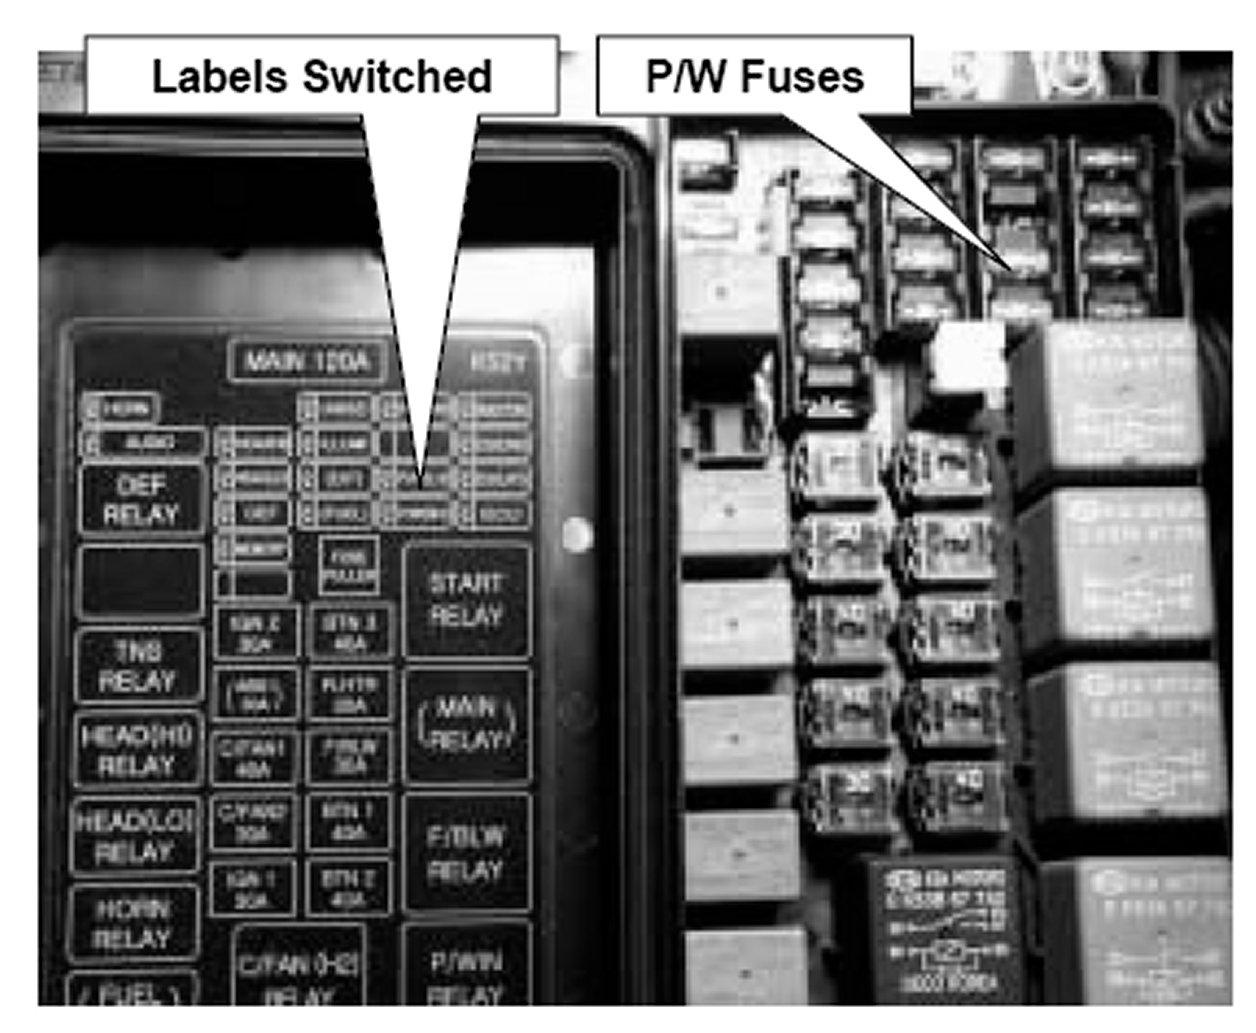 [DIAGRAM_5FD]  WD_5305] 2011 Kia Sorento Inner Fuse Box Diagram Download Diagram | 2006 Kia Sorento Fuse Box |  | Iness Kesian Illuminateatx Librar Wiring 101